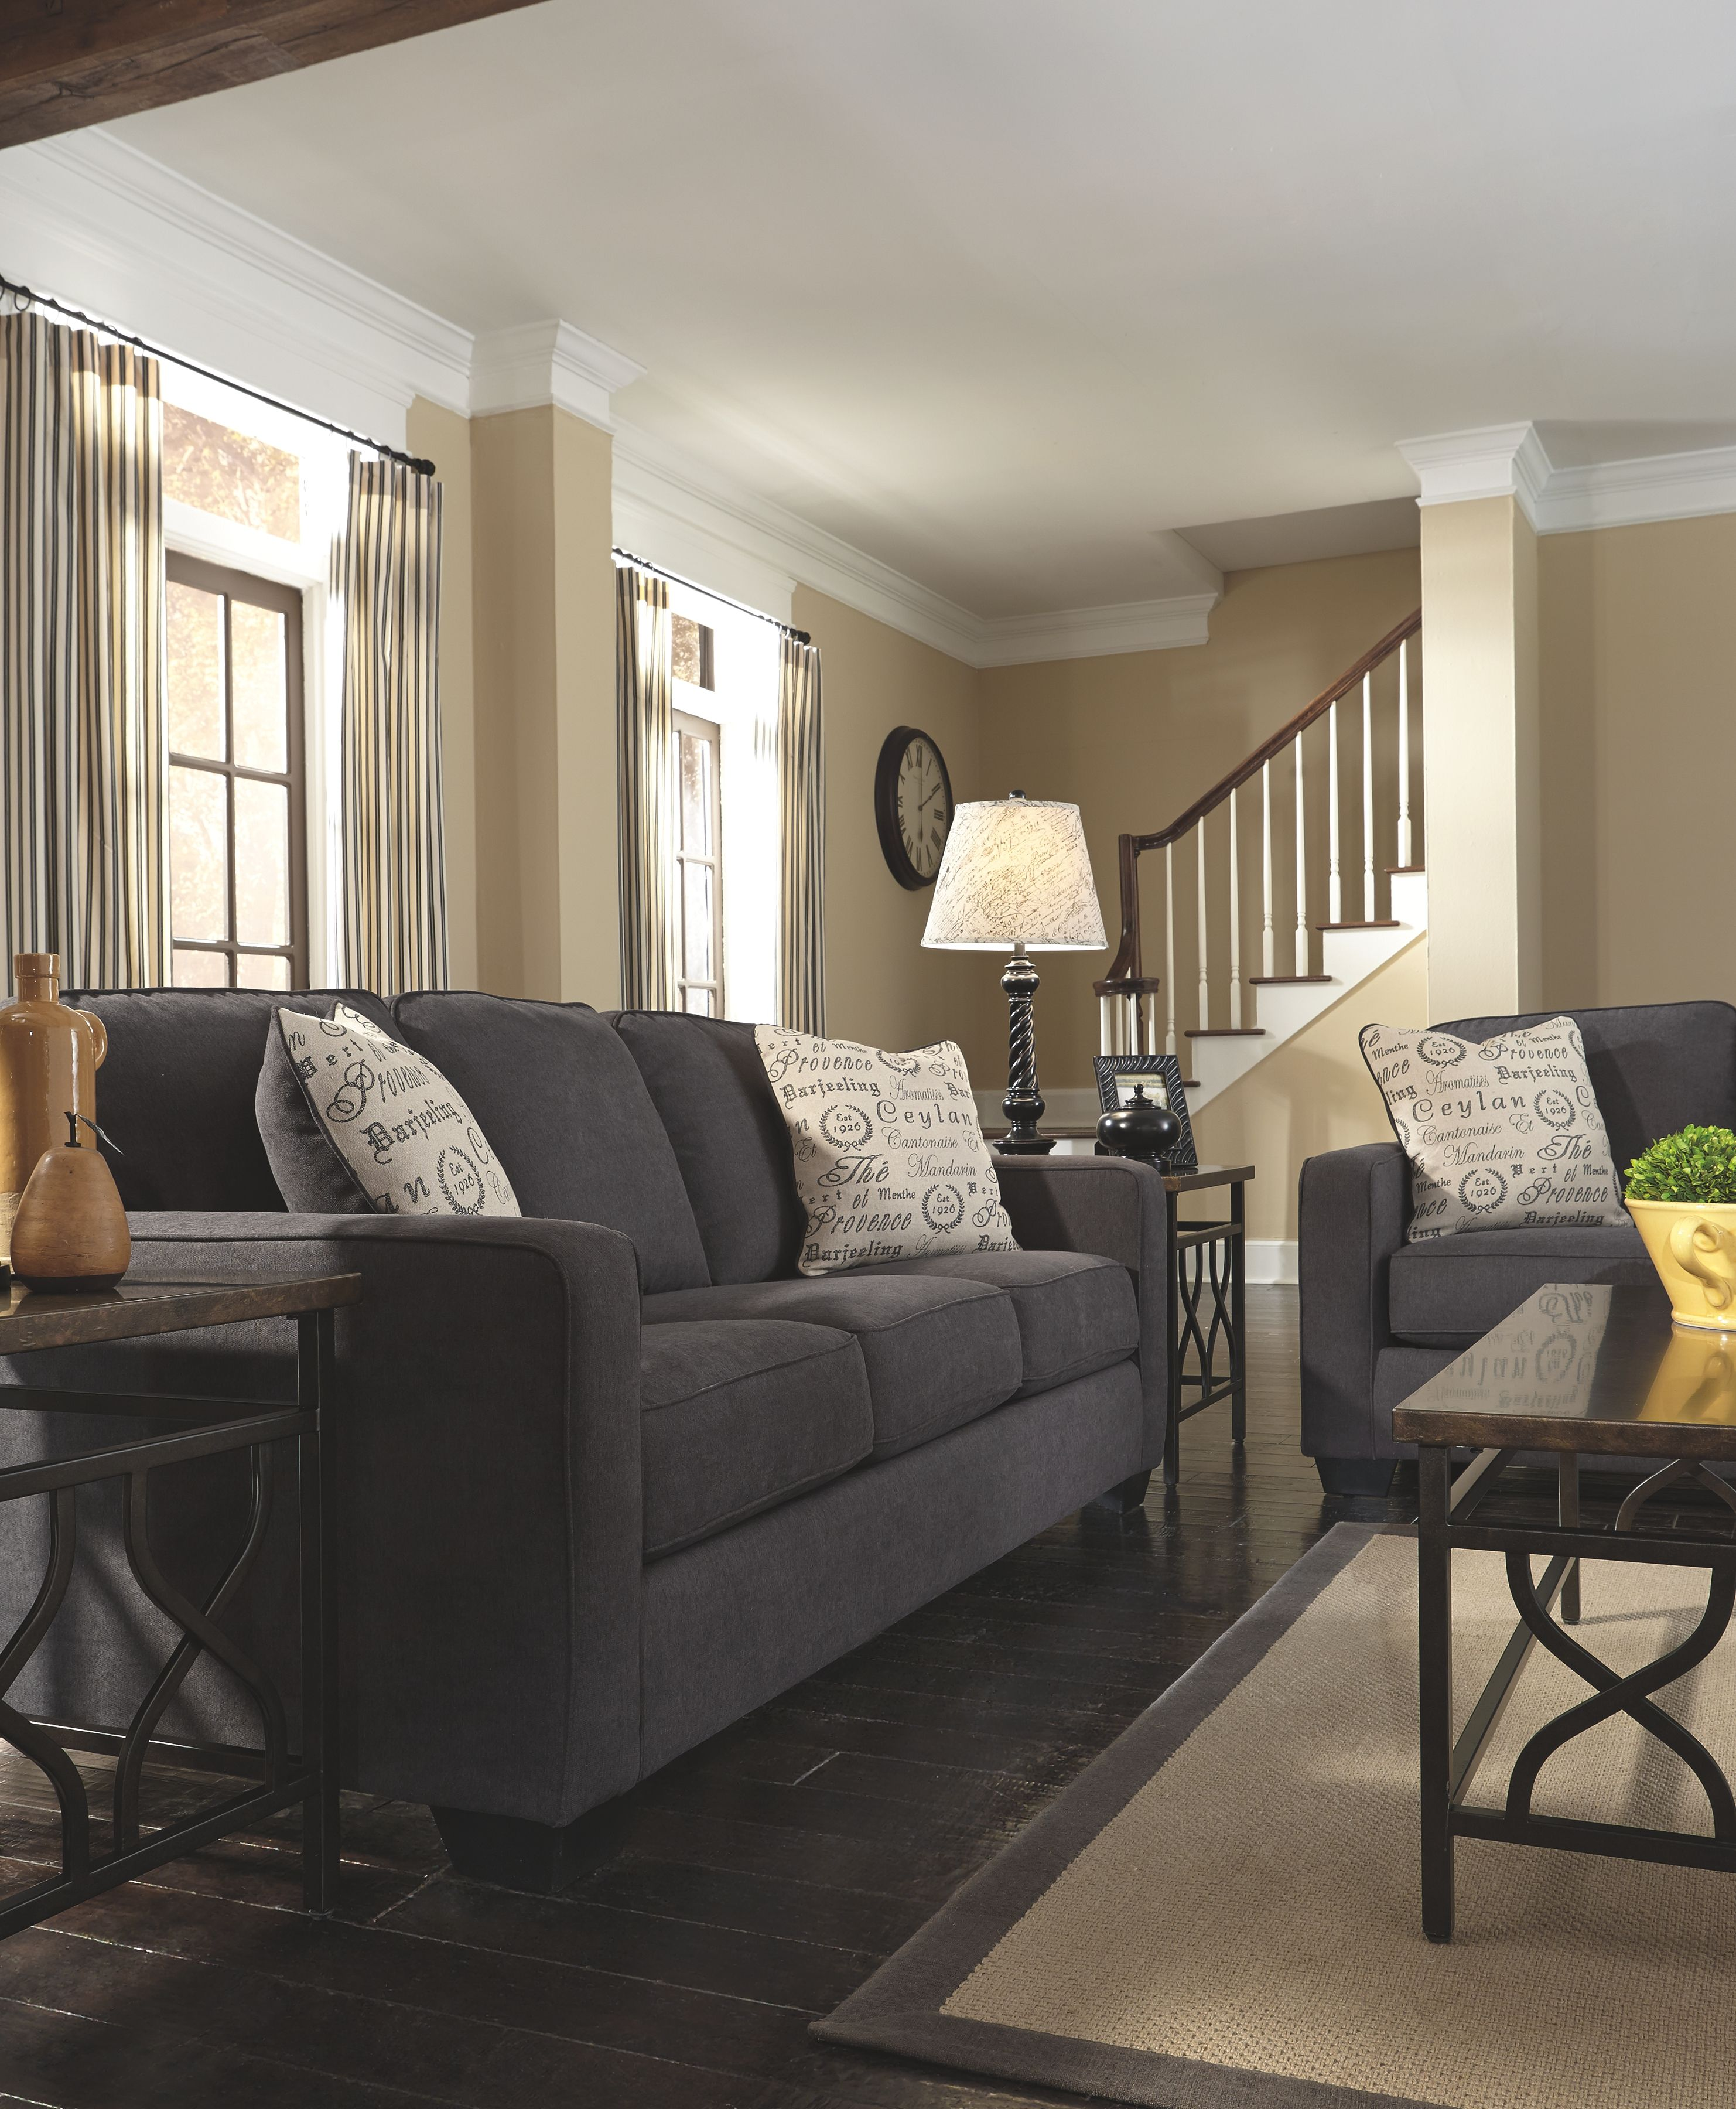 Alenya Queen Sofa Sleeper Charcoal In 2020 Living Room Color